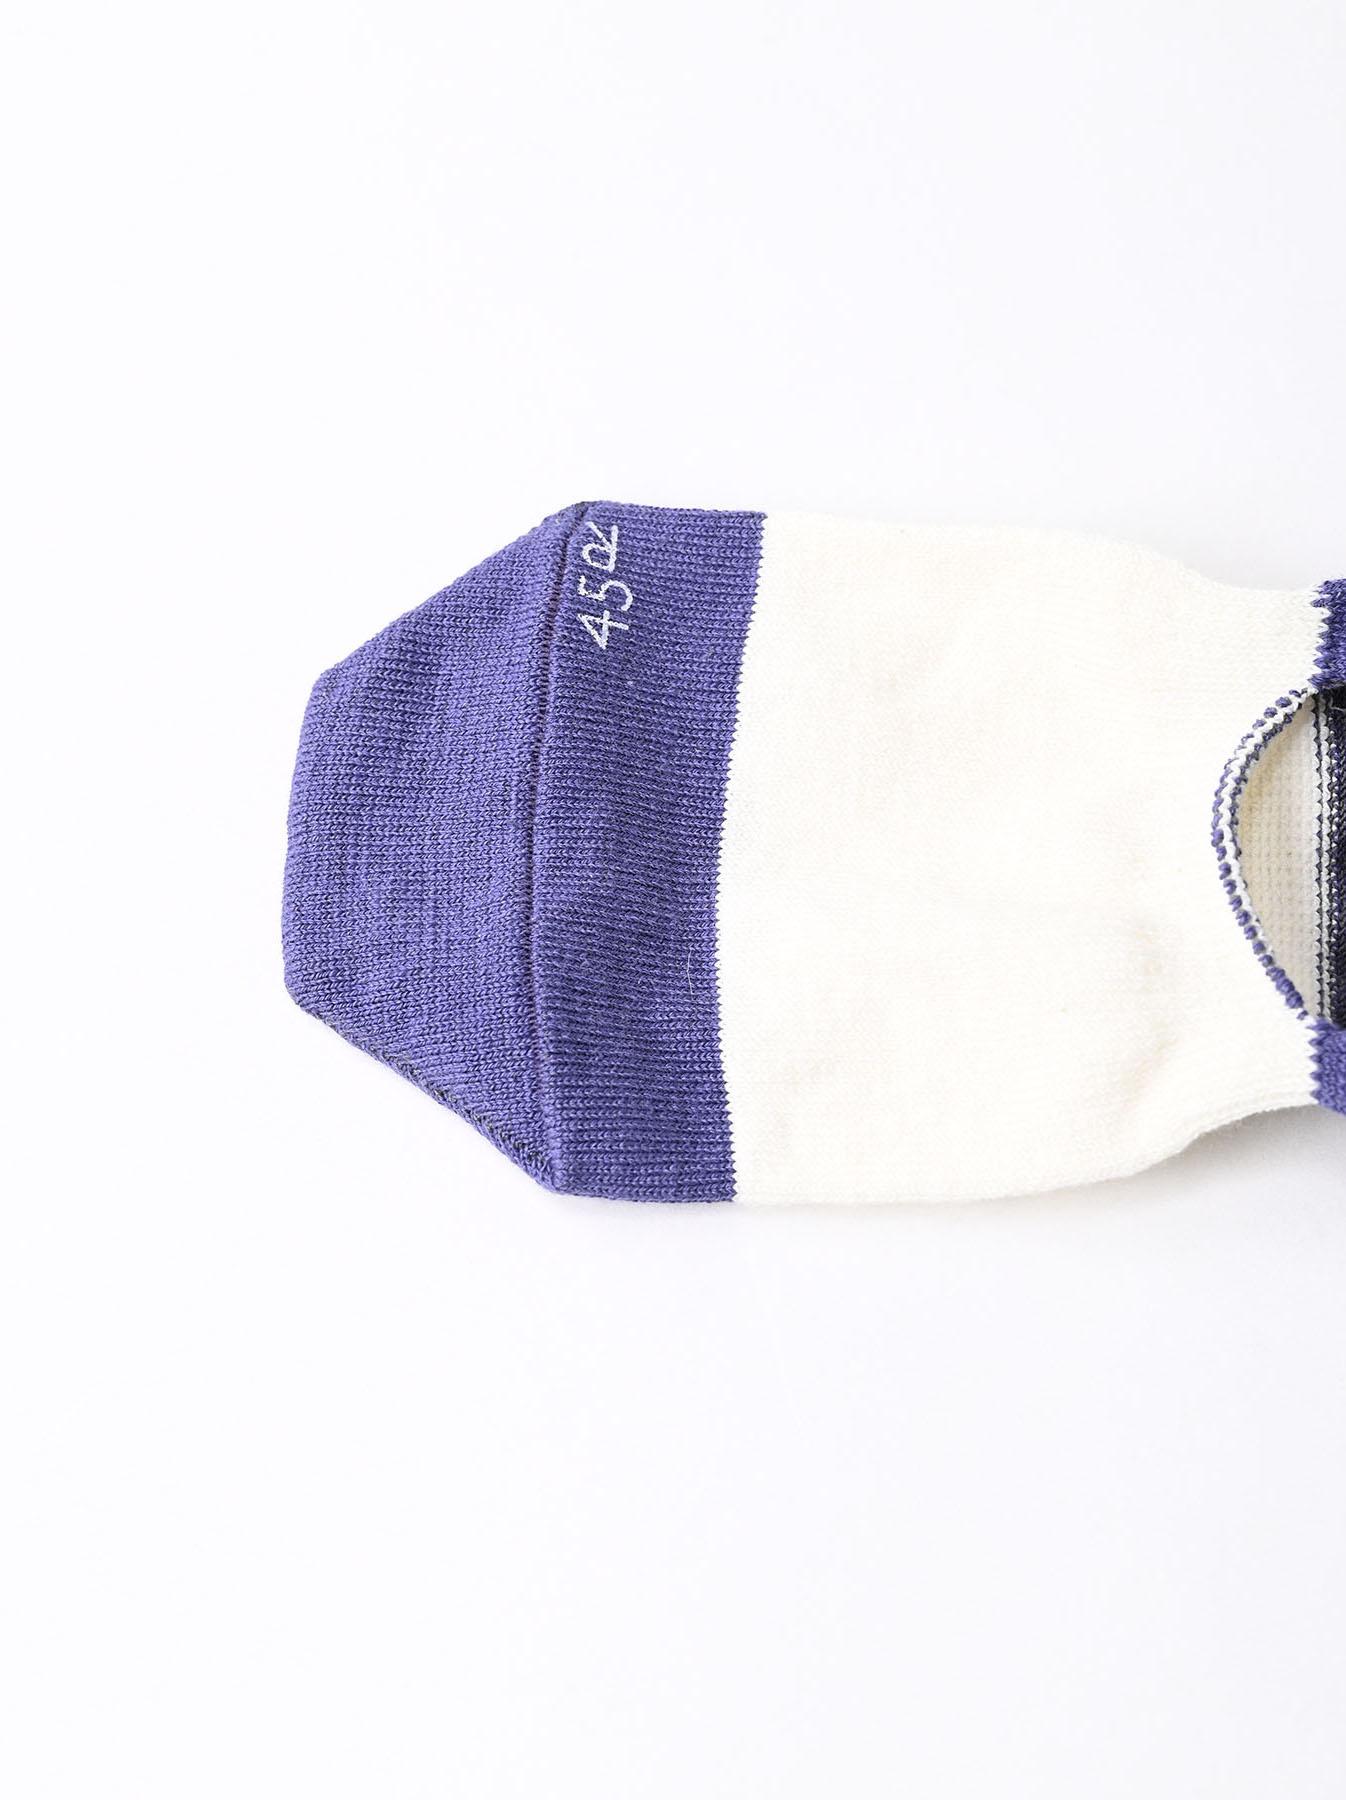 Bussol Socks (0321)-6